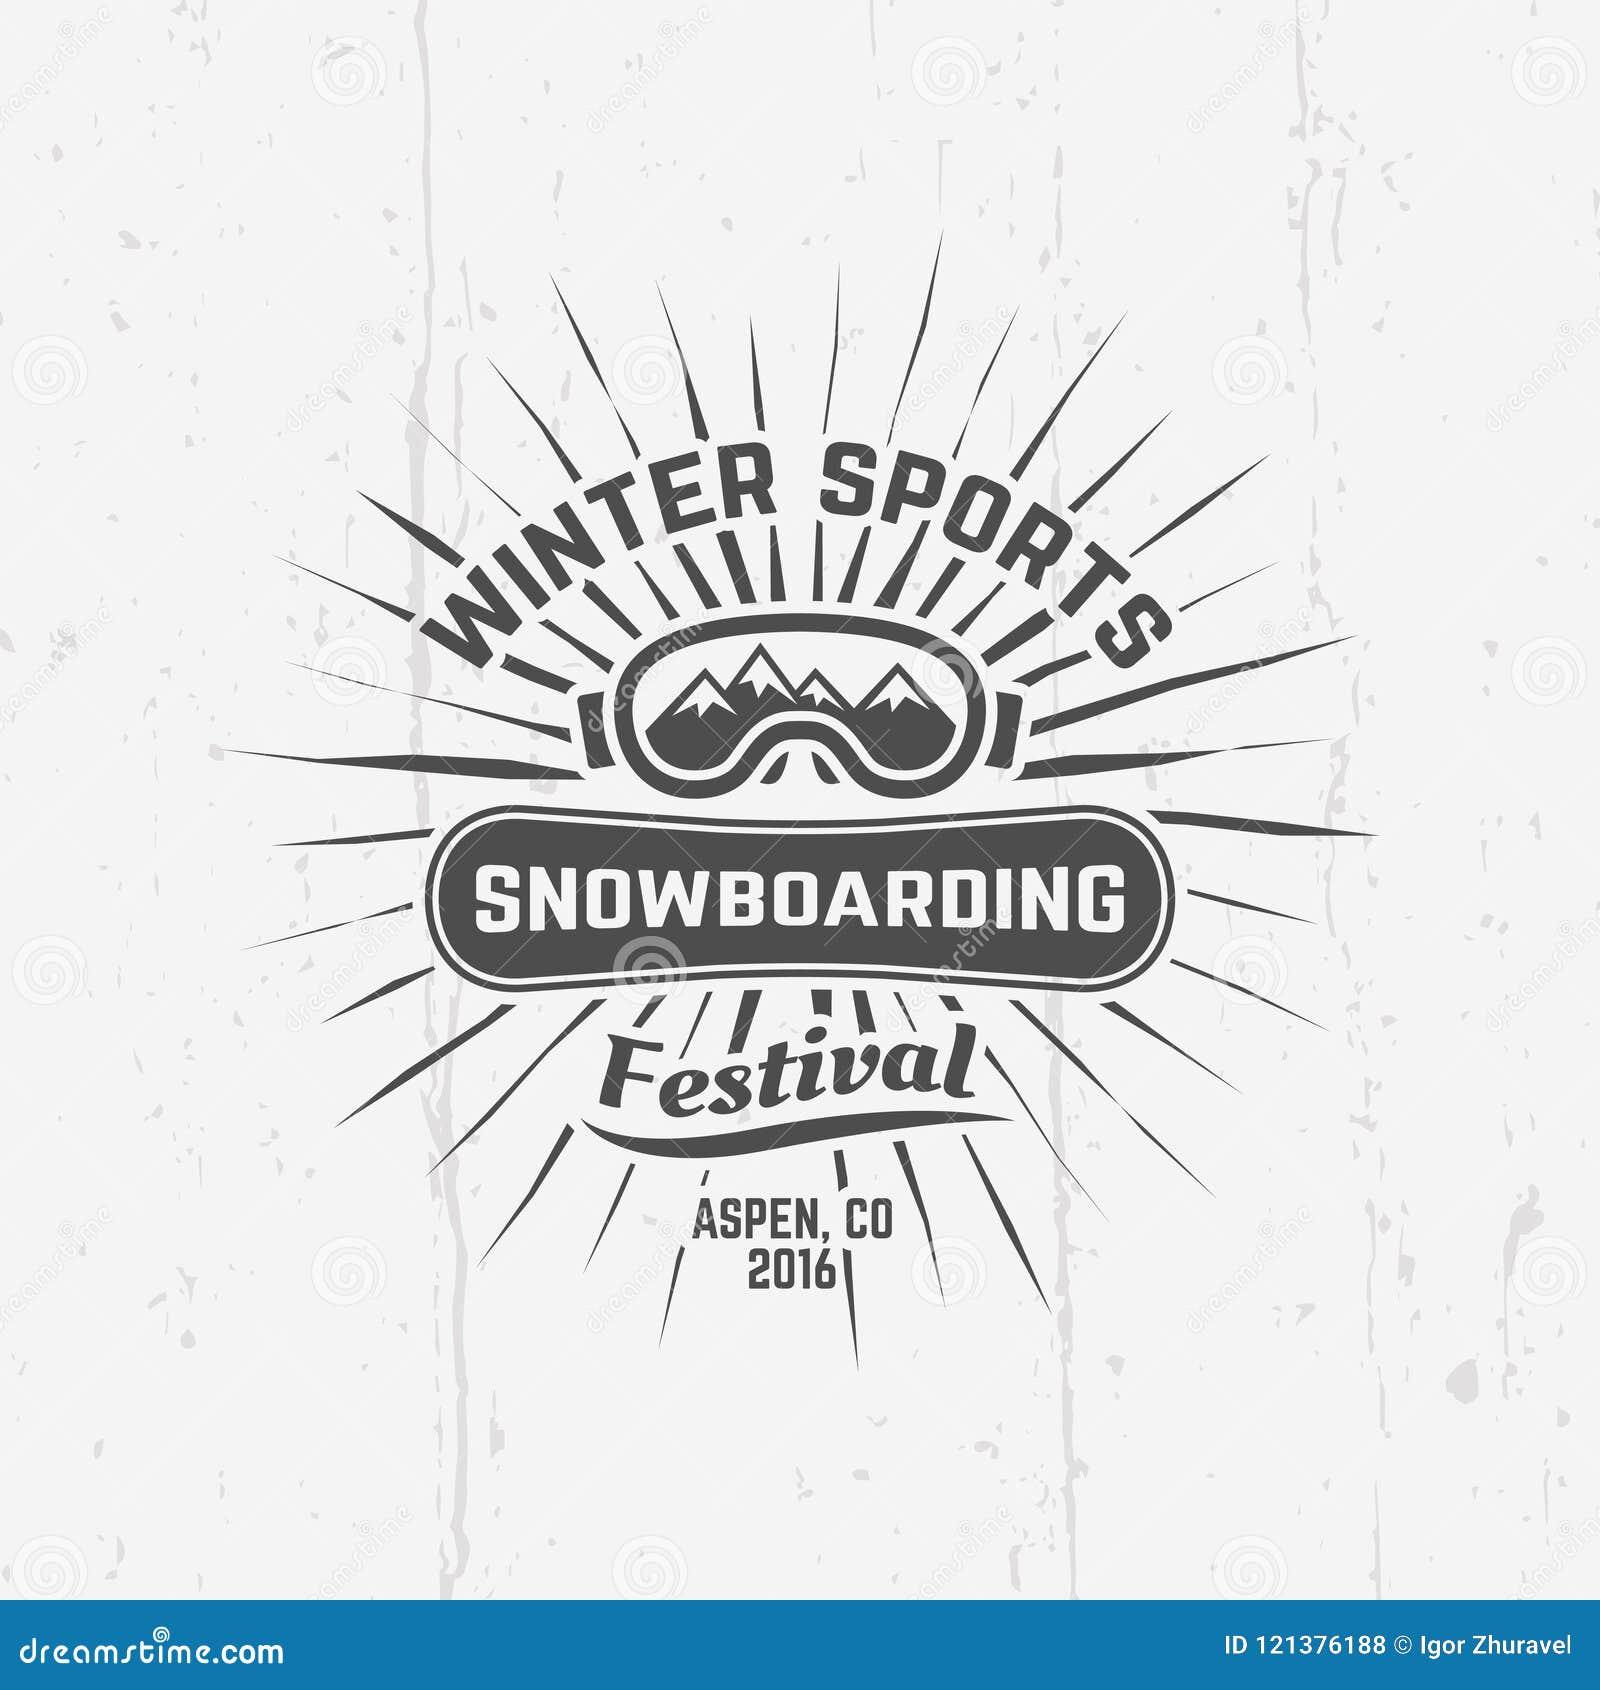 Snowboarding, Winter Sports Vector Black Emblem Stock Vector ...